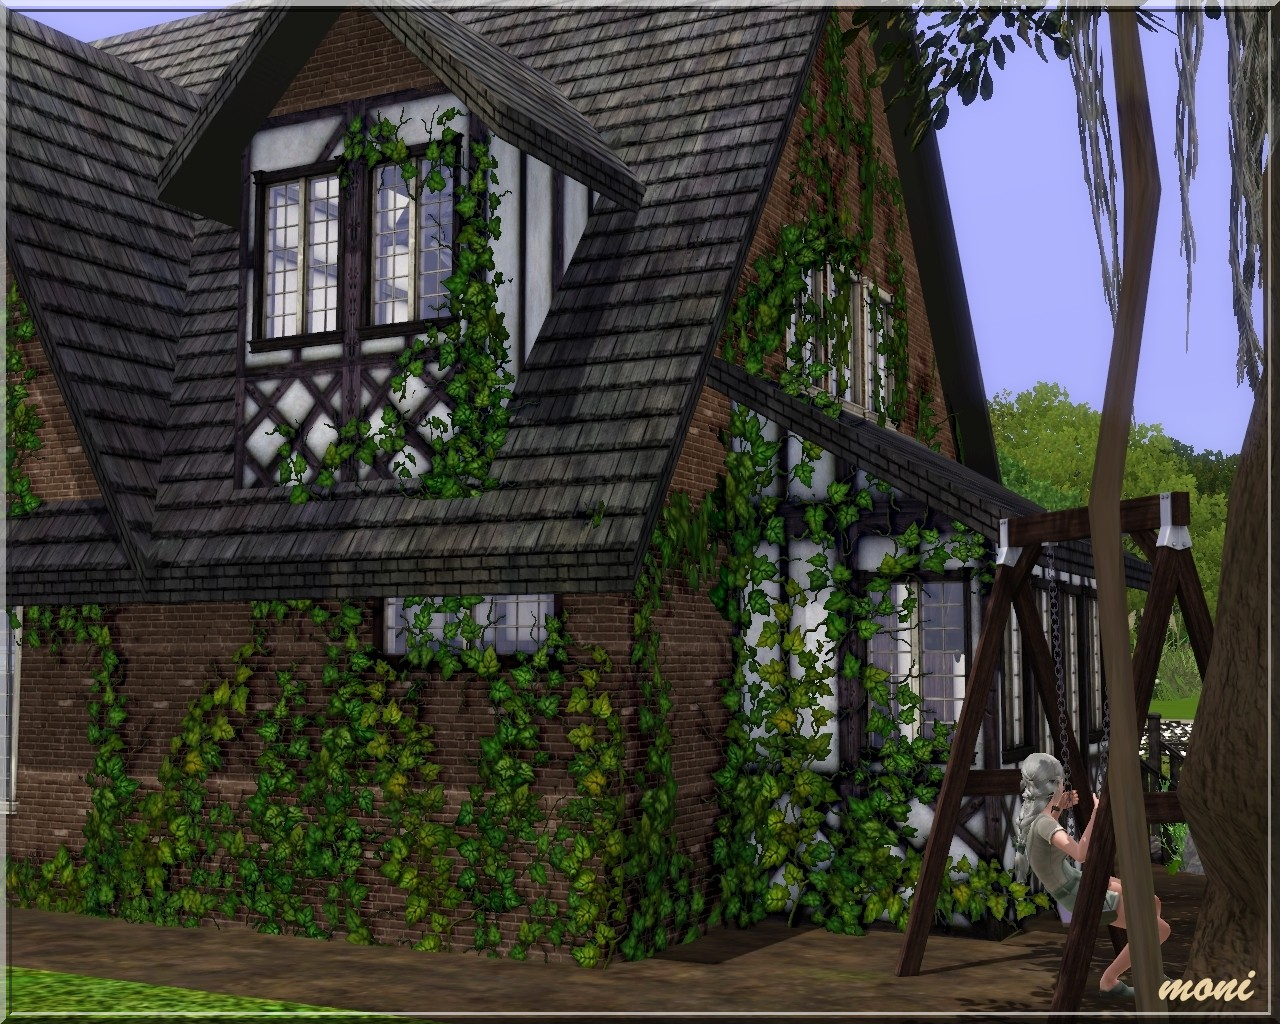 arda sims tudor house ii. Black Bedroom Furniture Sets. Home Design Ideas